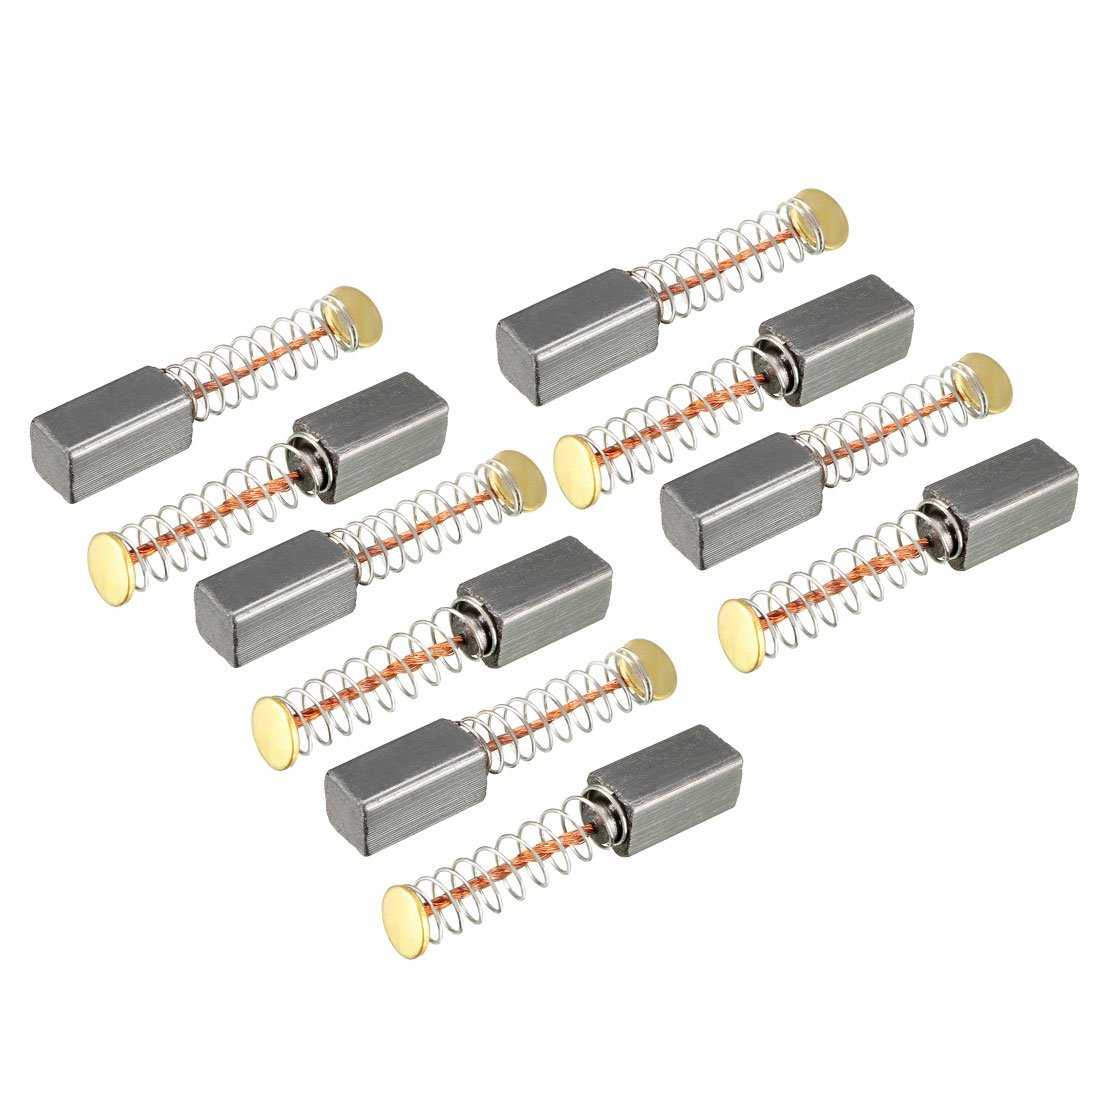 sourcingmap Carbon Brushes for Electric Motors 13mm x 8mm x 5mm Replacement Repair Part 2pcs